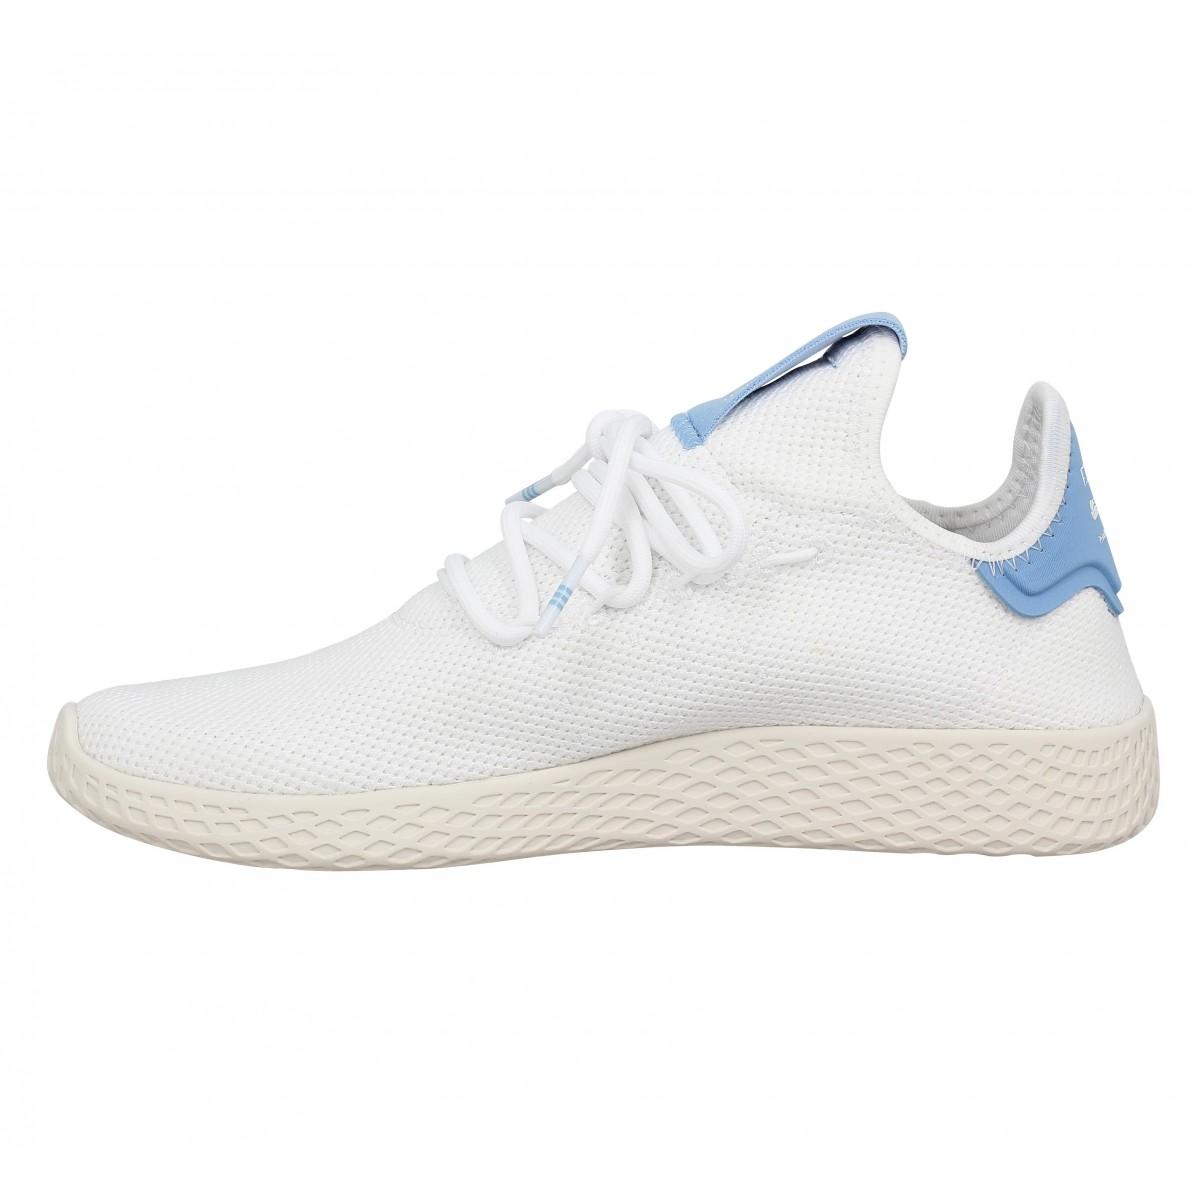 Chaussures Adidas x pharrell williams pw tennis mesh blanc bleu ...